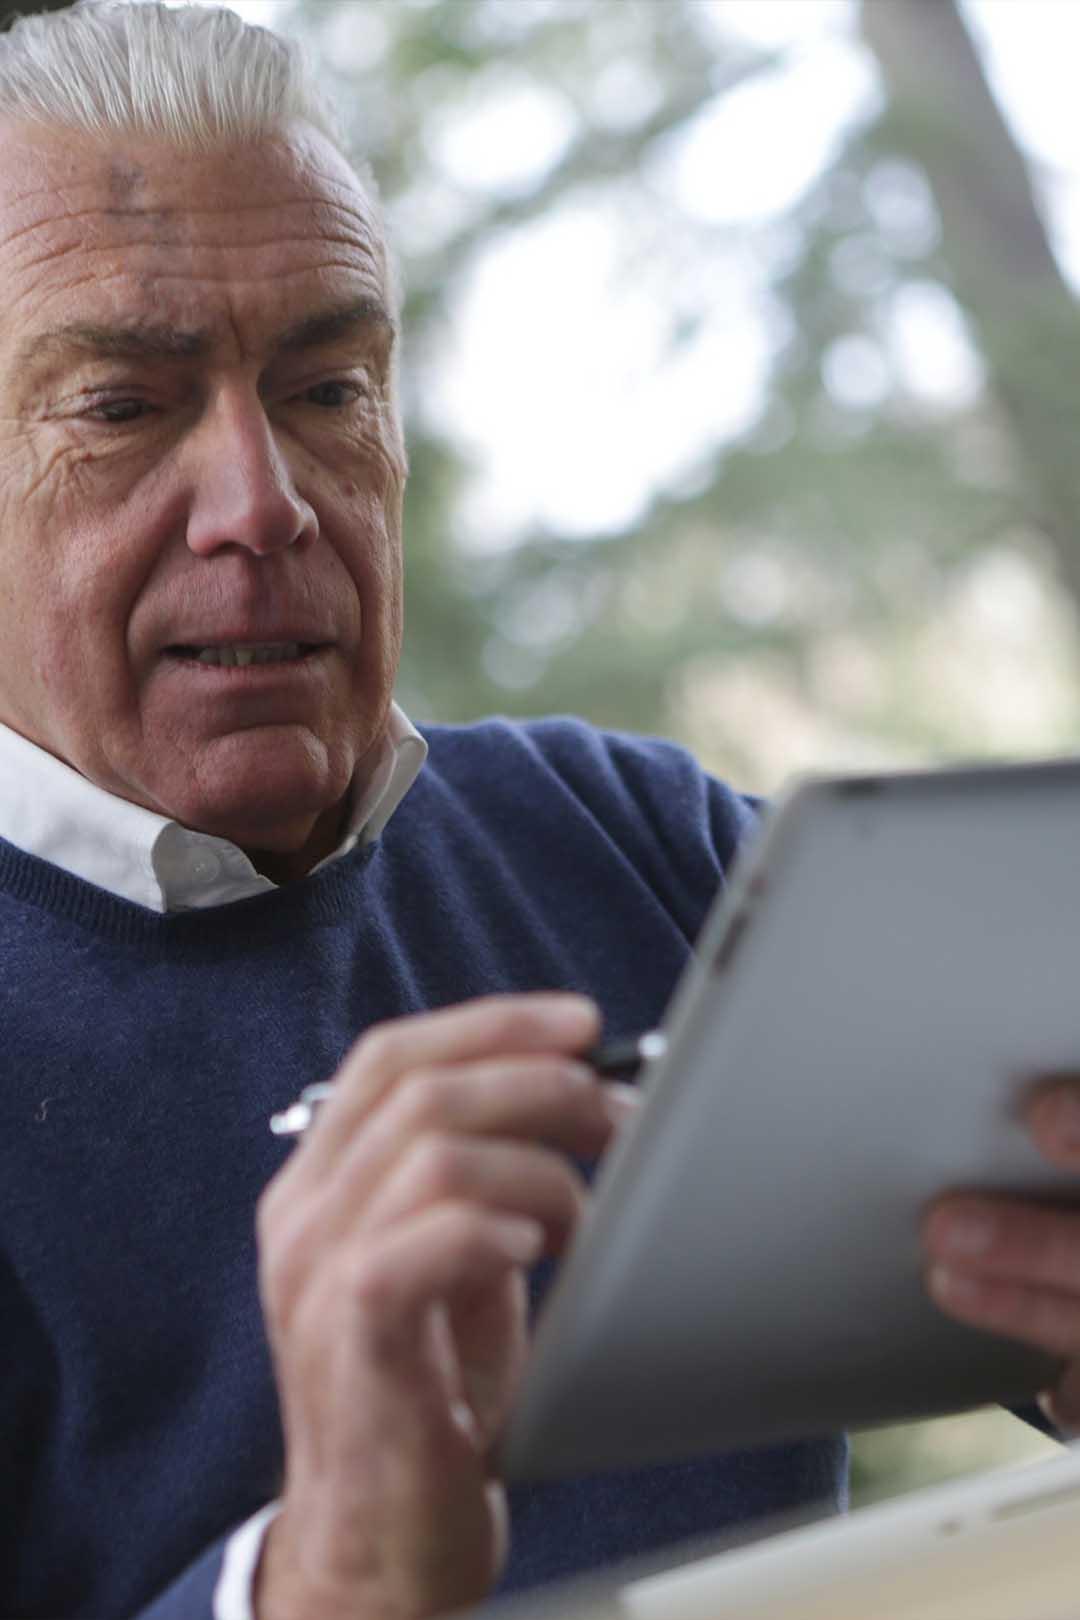 man eSigning on tablet